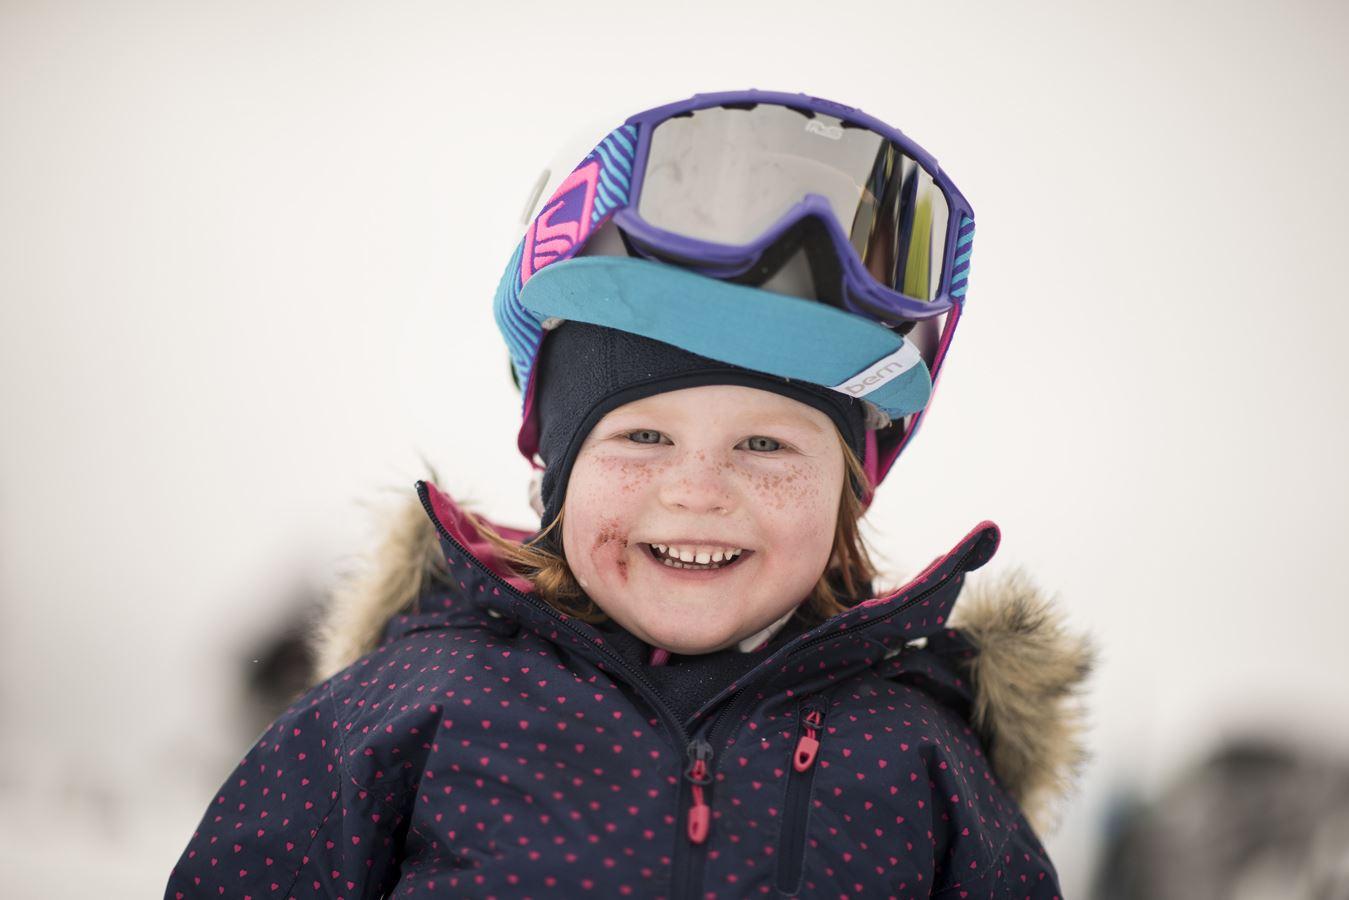 KIDS Ansiktsmaling og lek med skiskolen